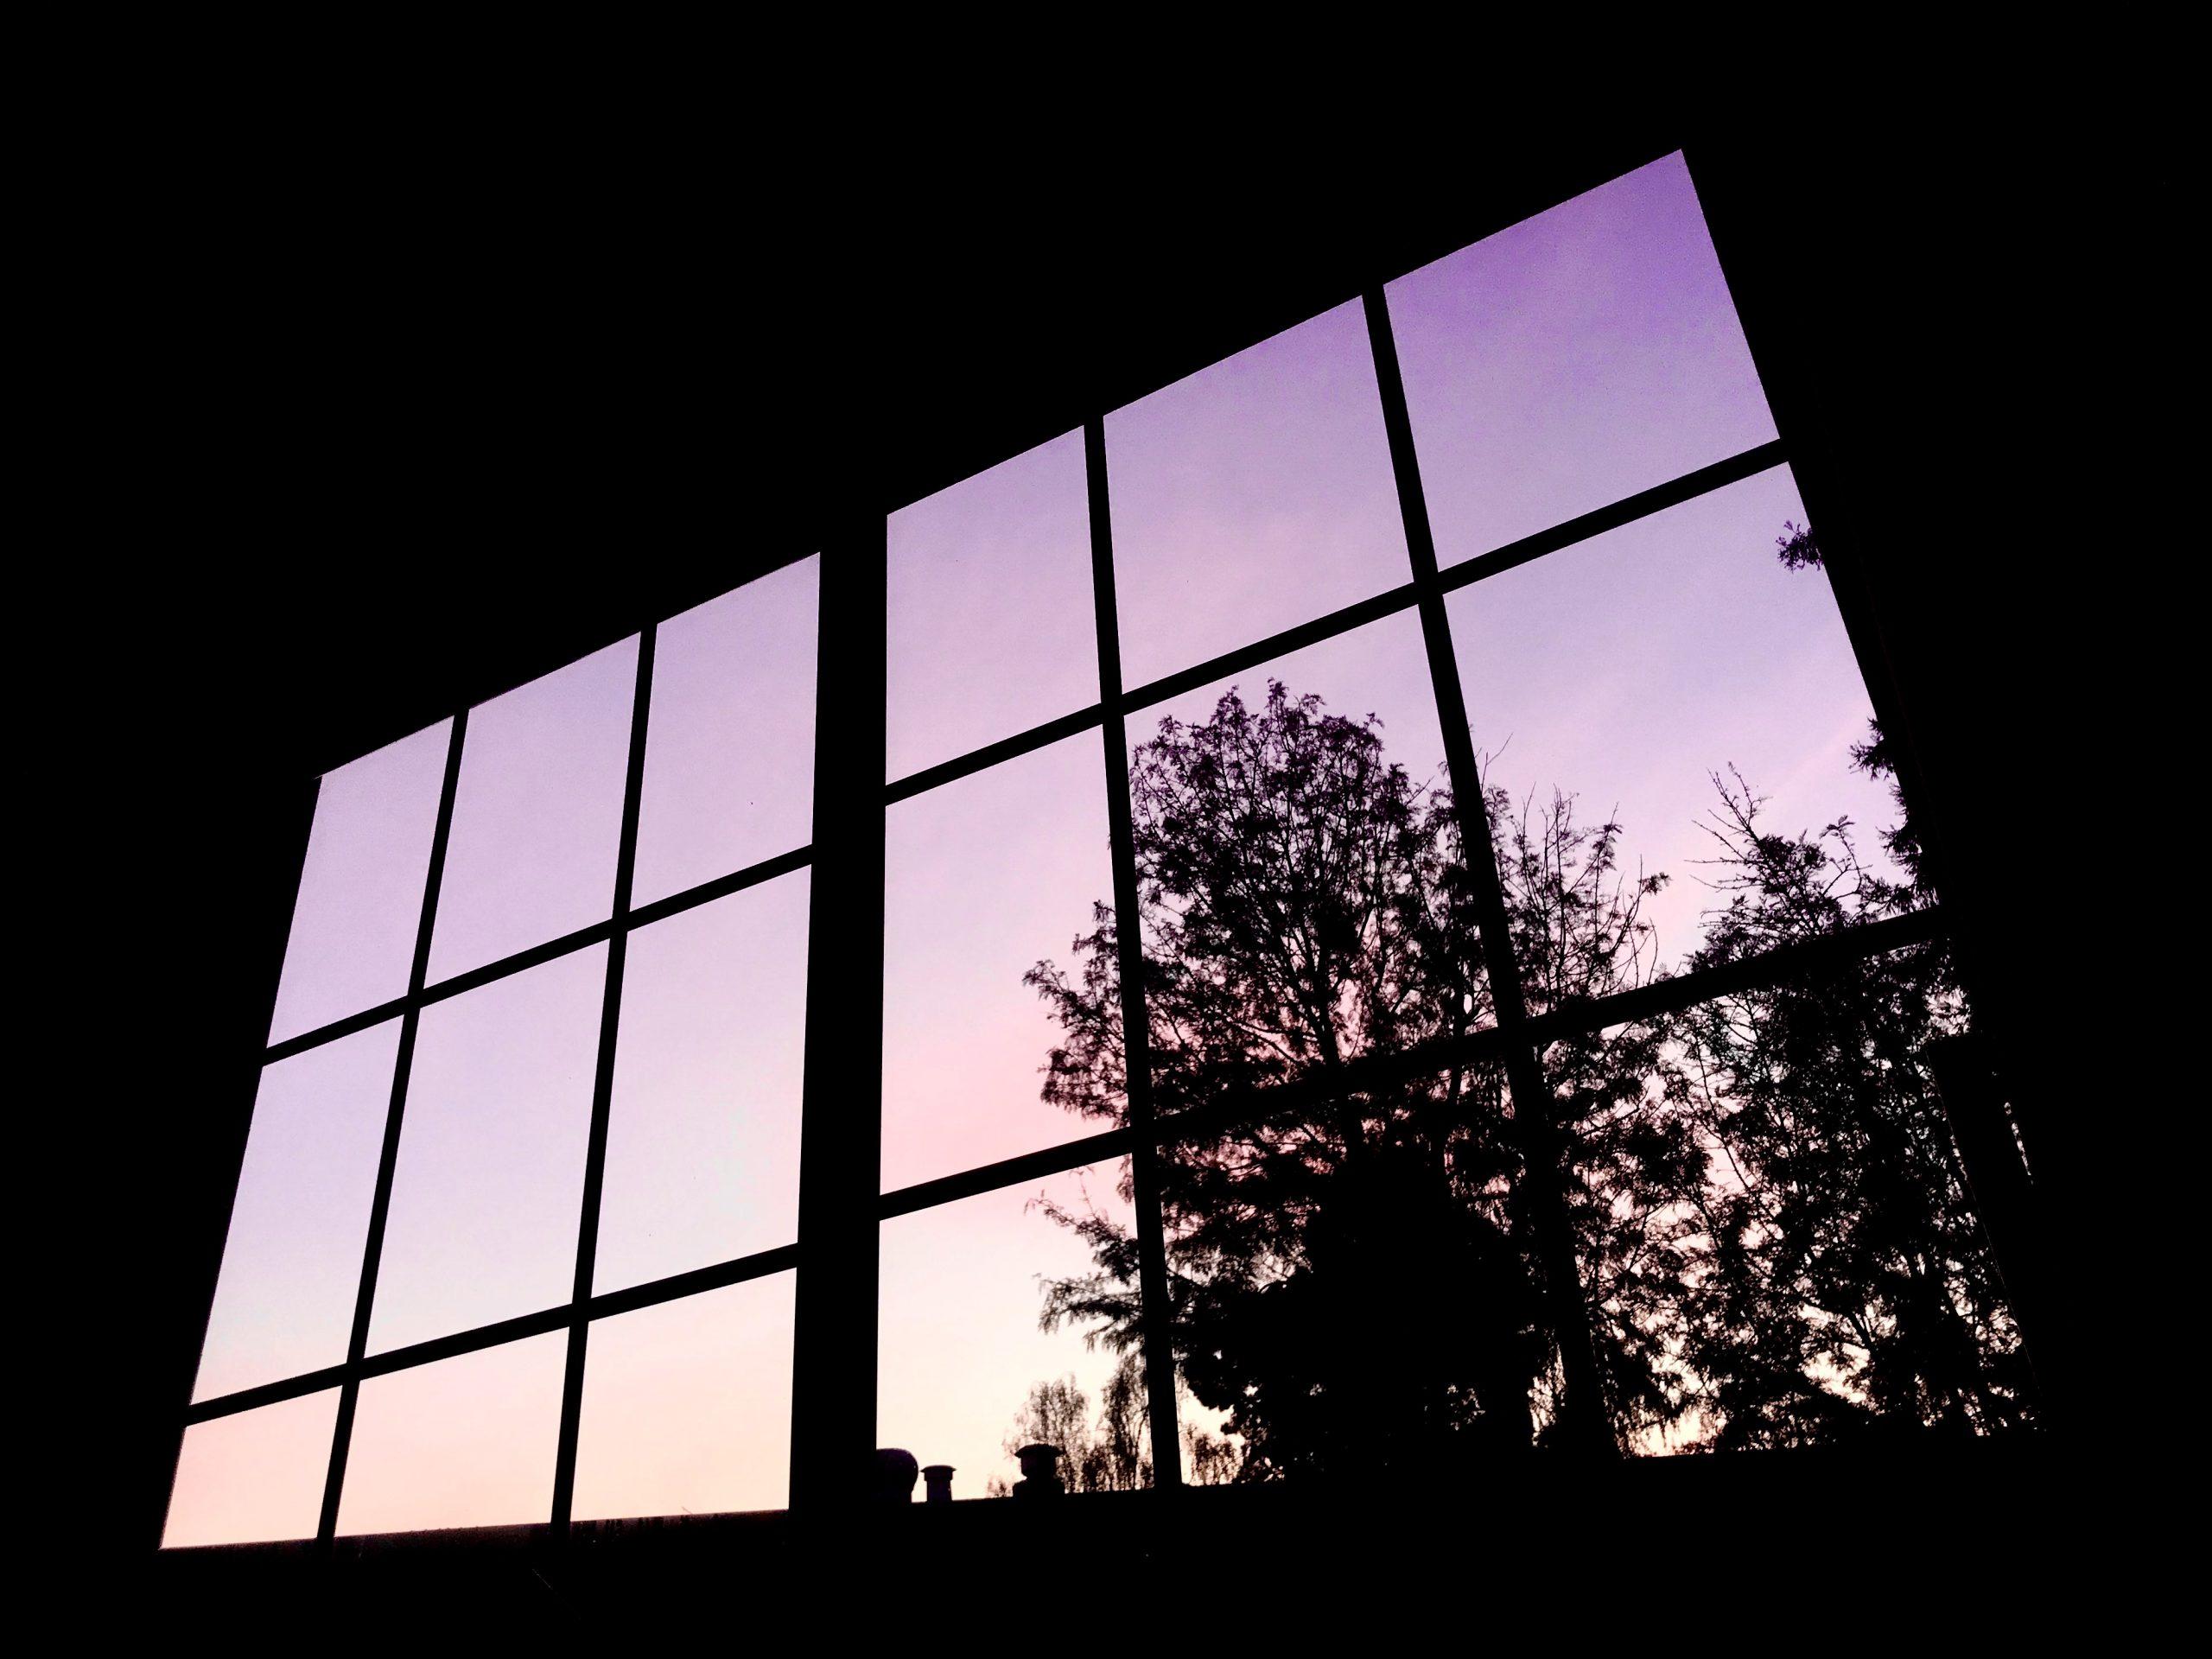 A window and a purple sky with trees.